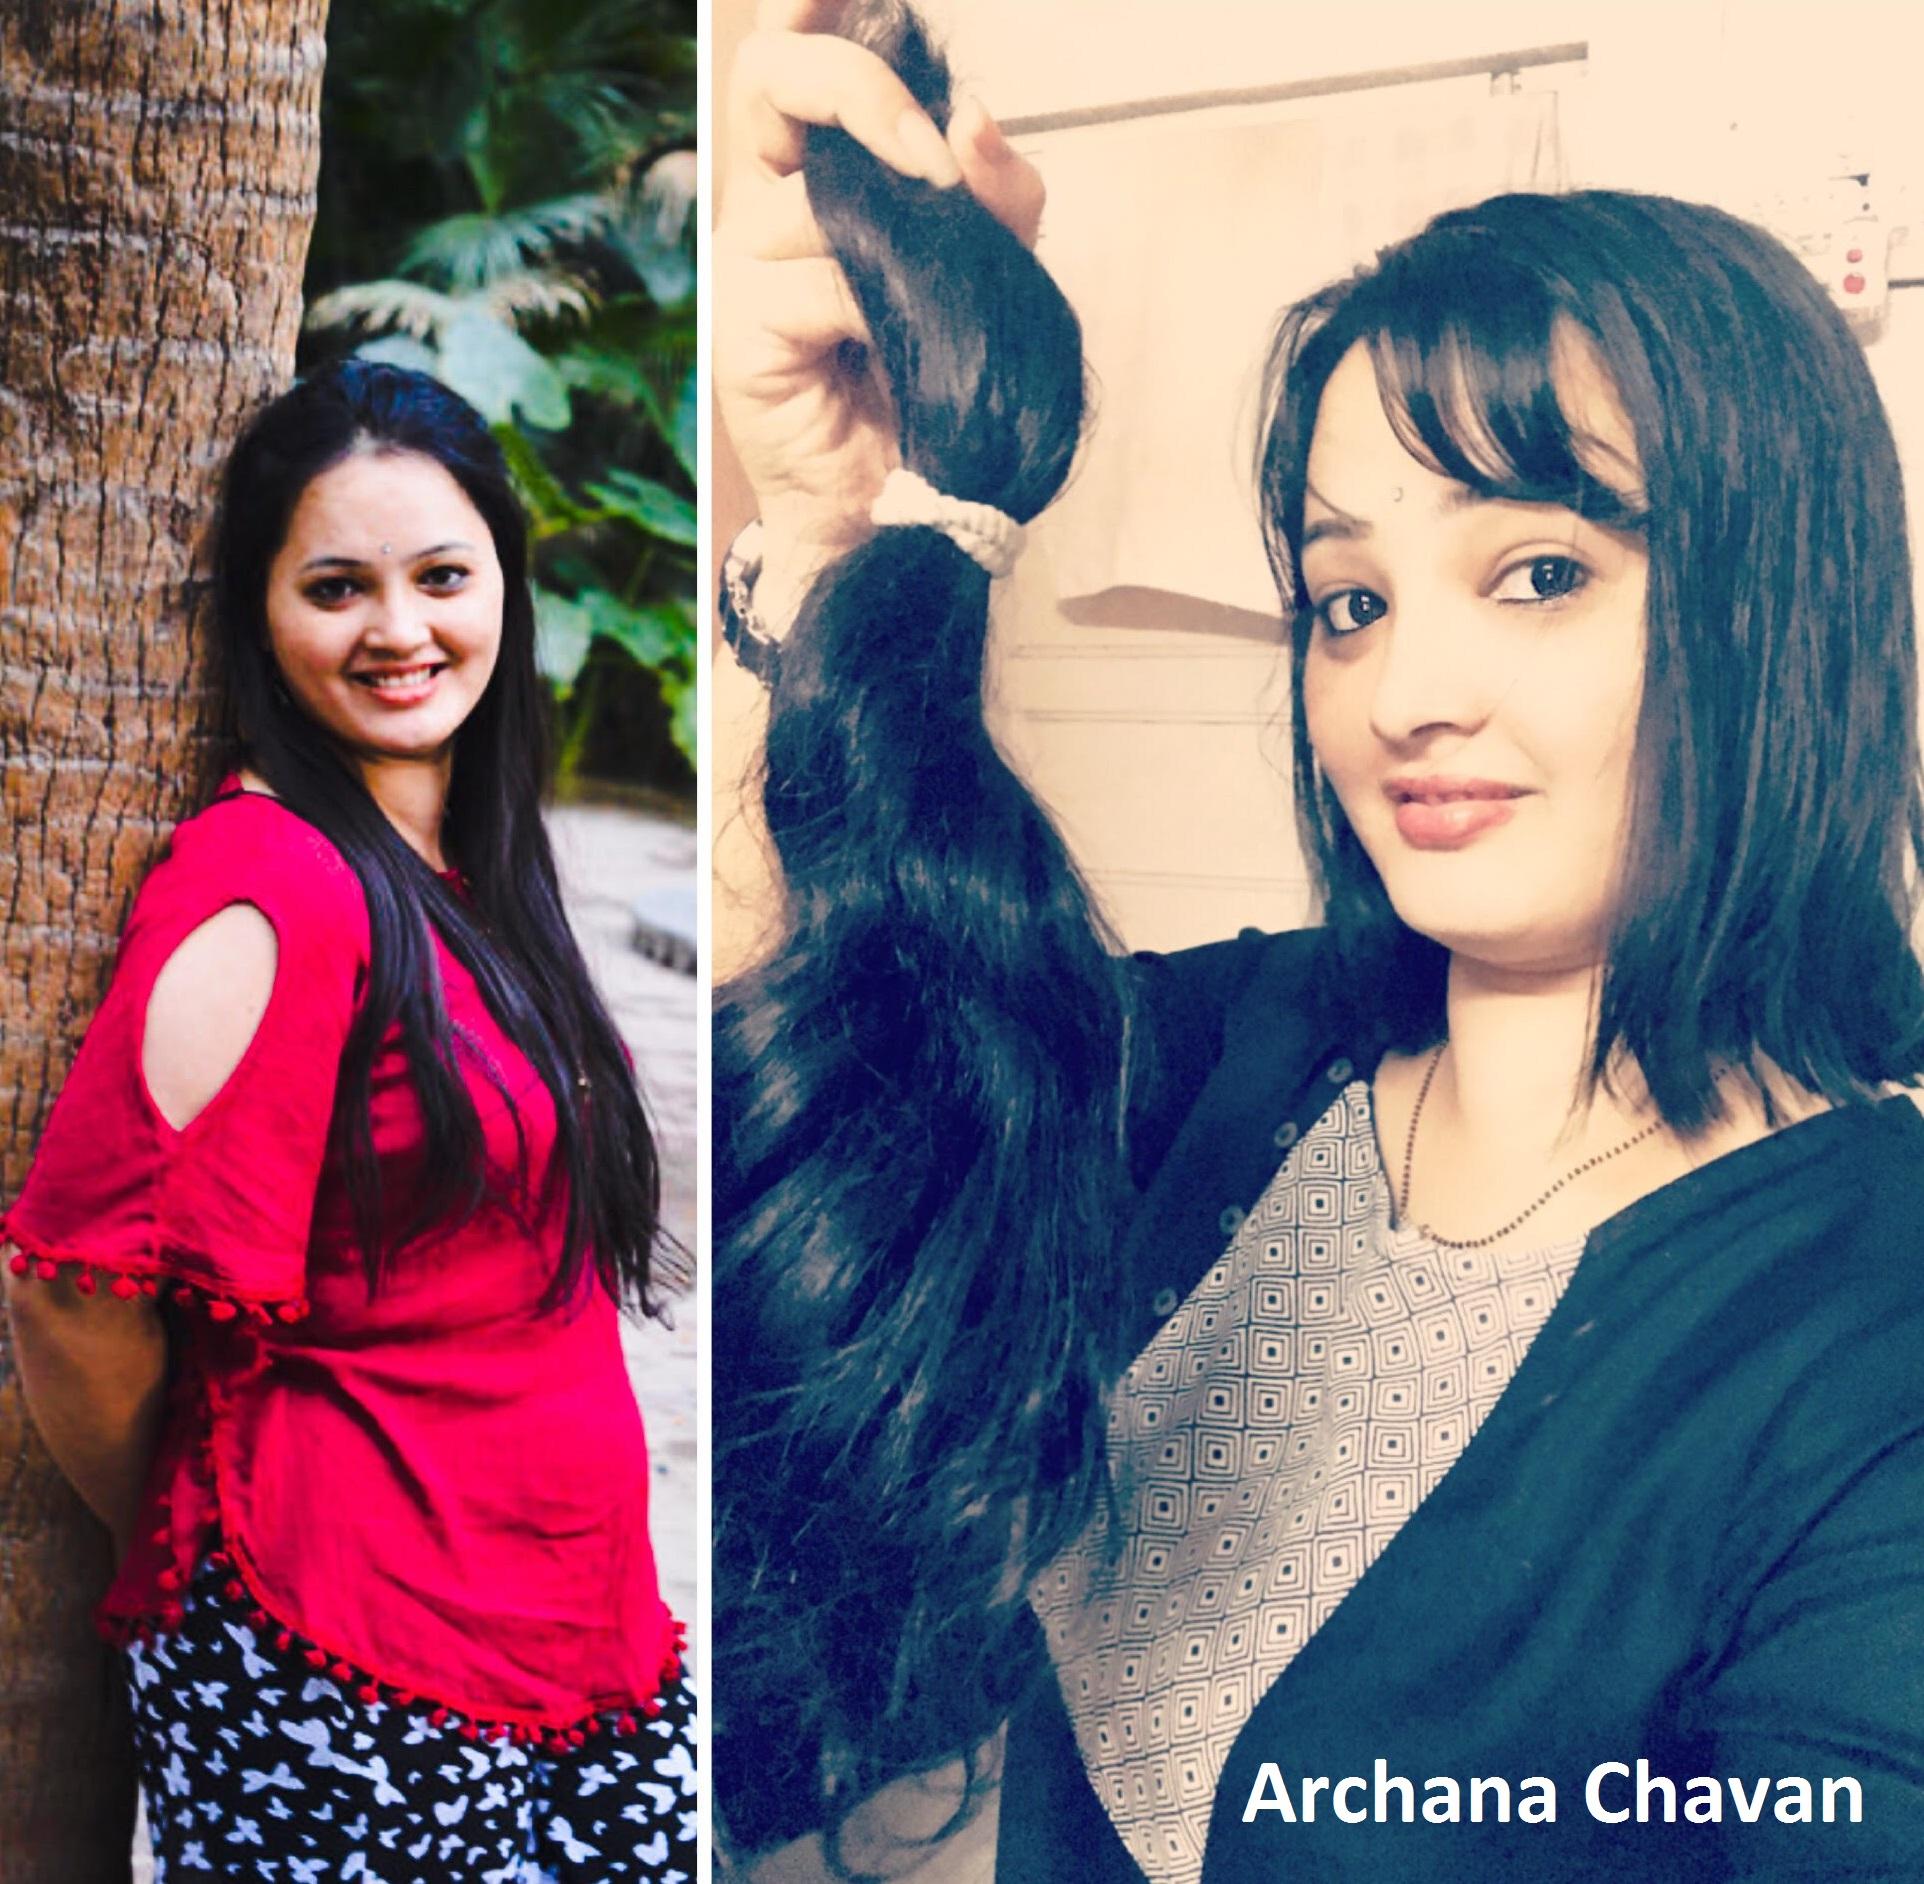 Archana Chavan